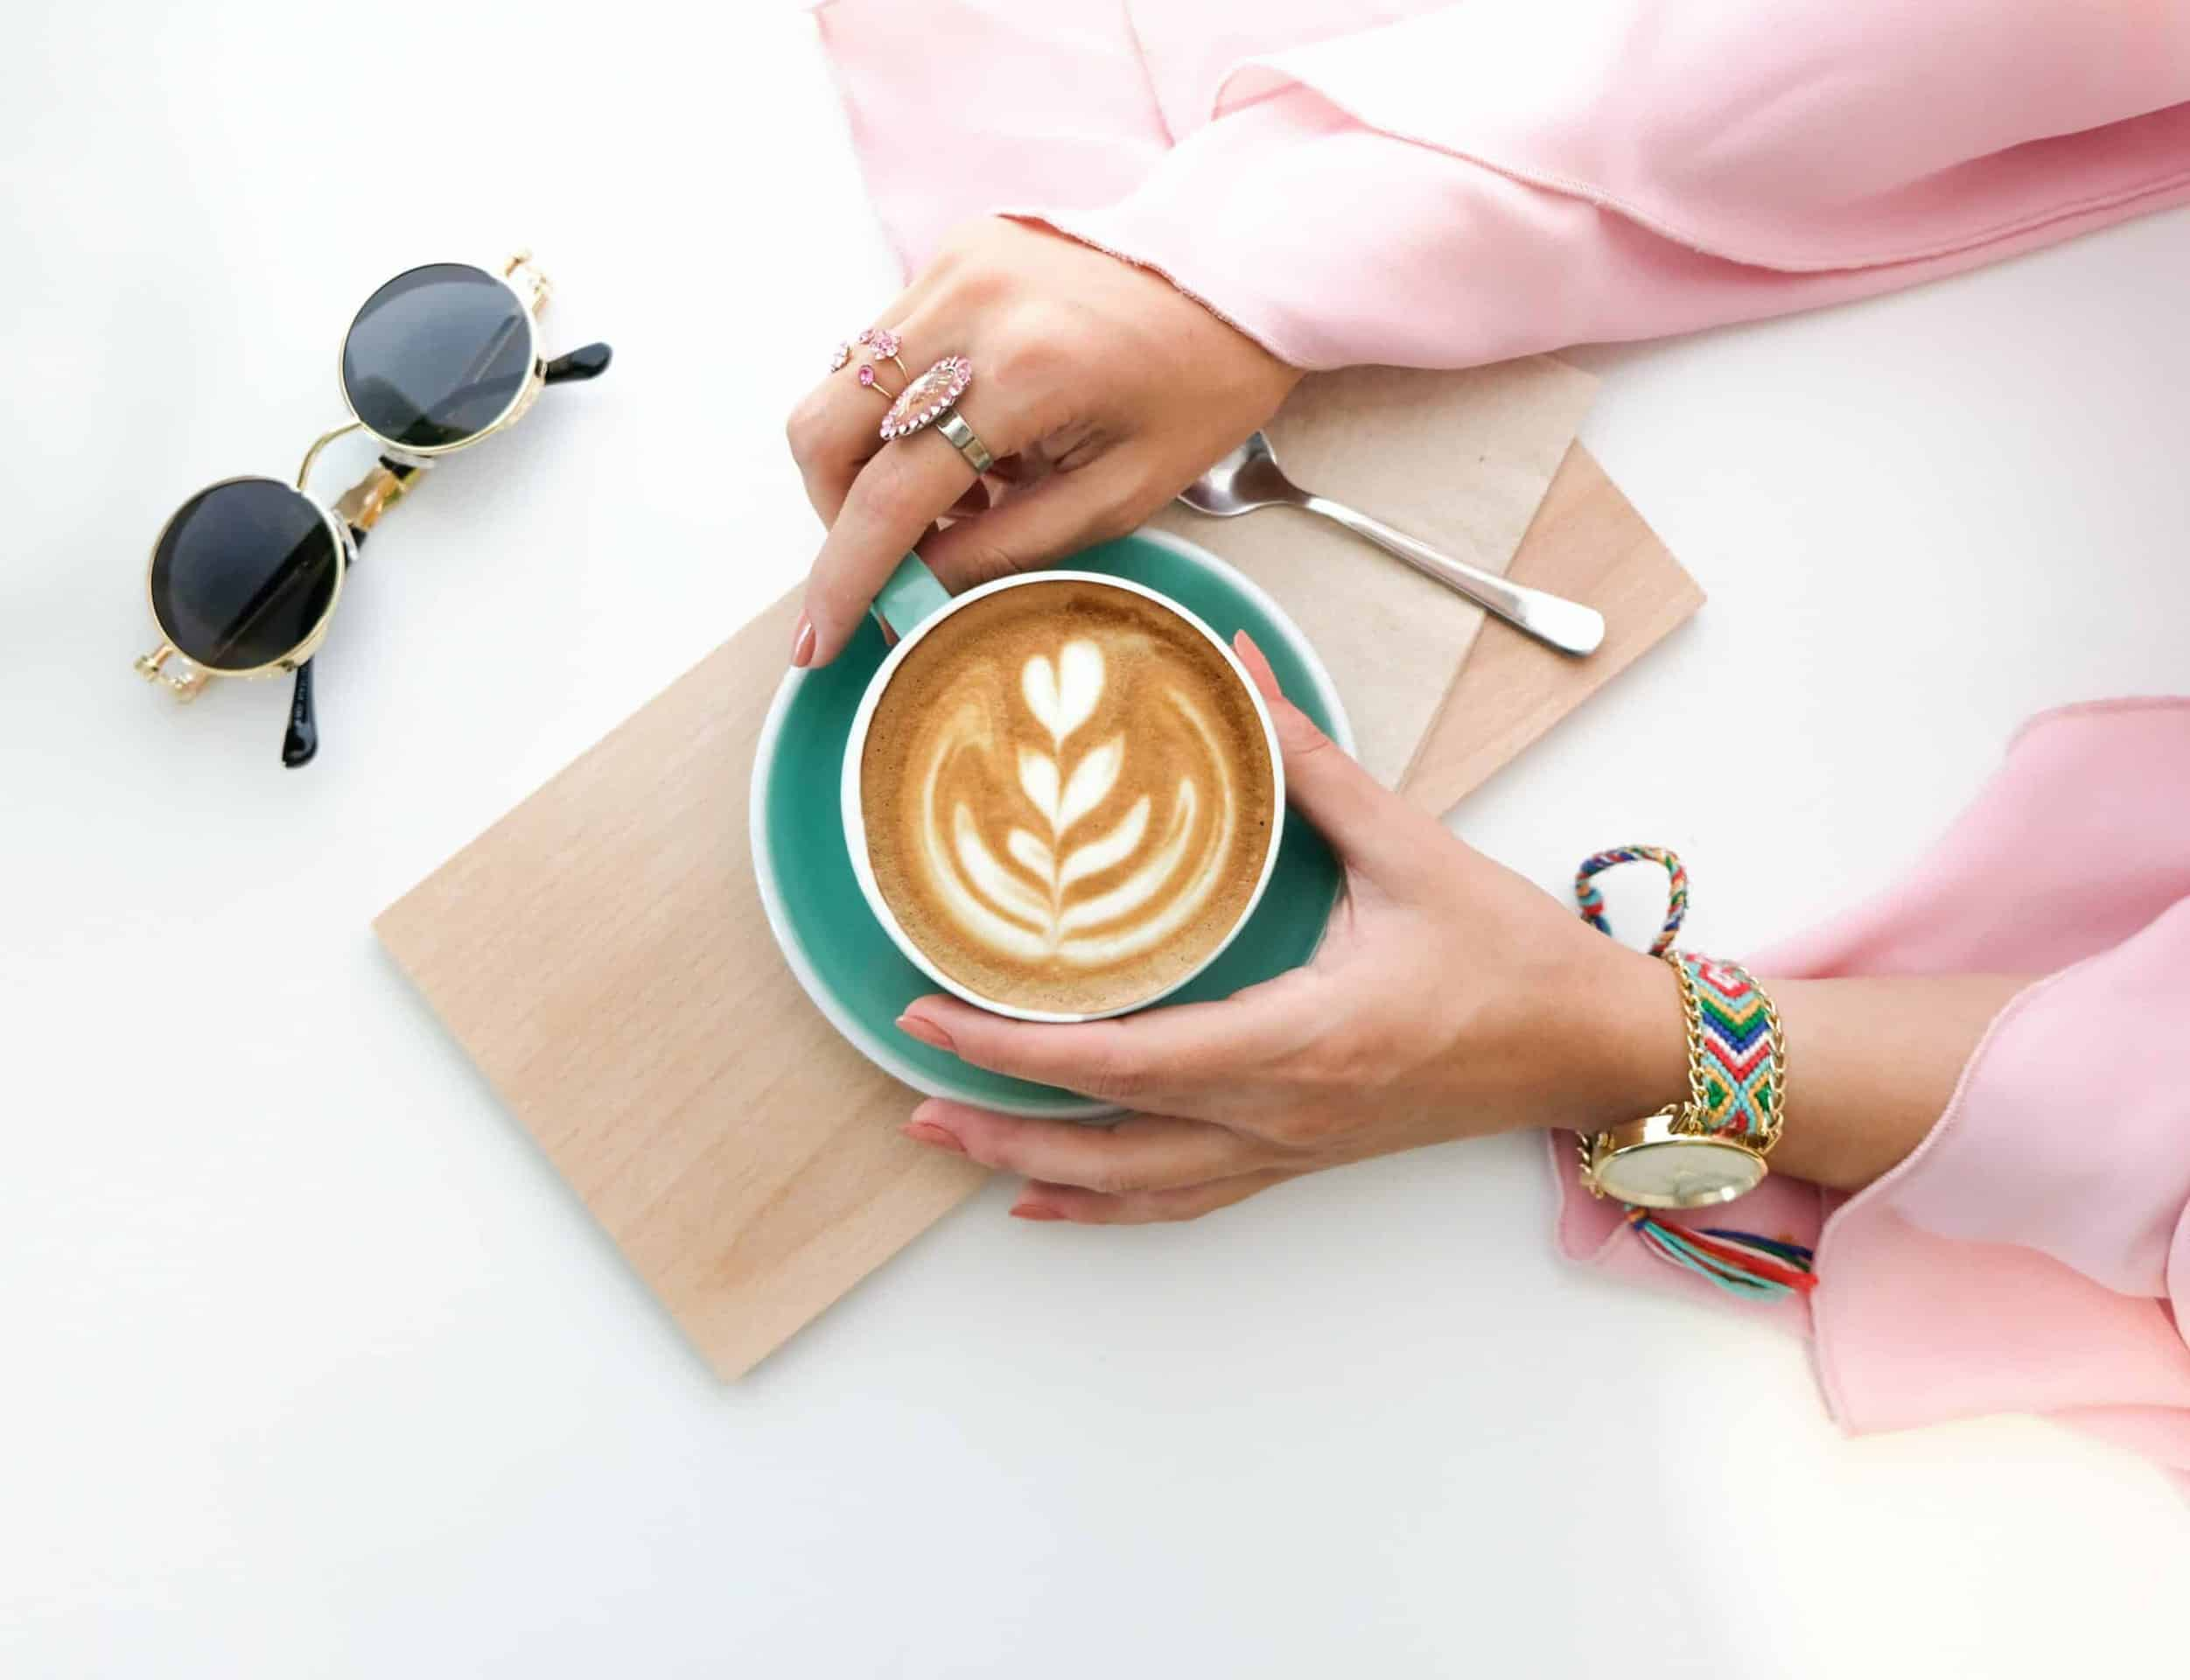 Starbucks' New Brand Campaign Pulls at Heartstrings